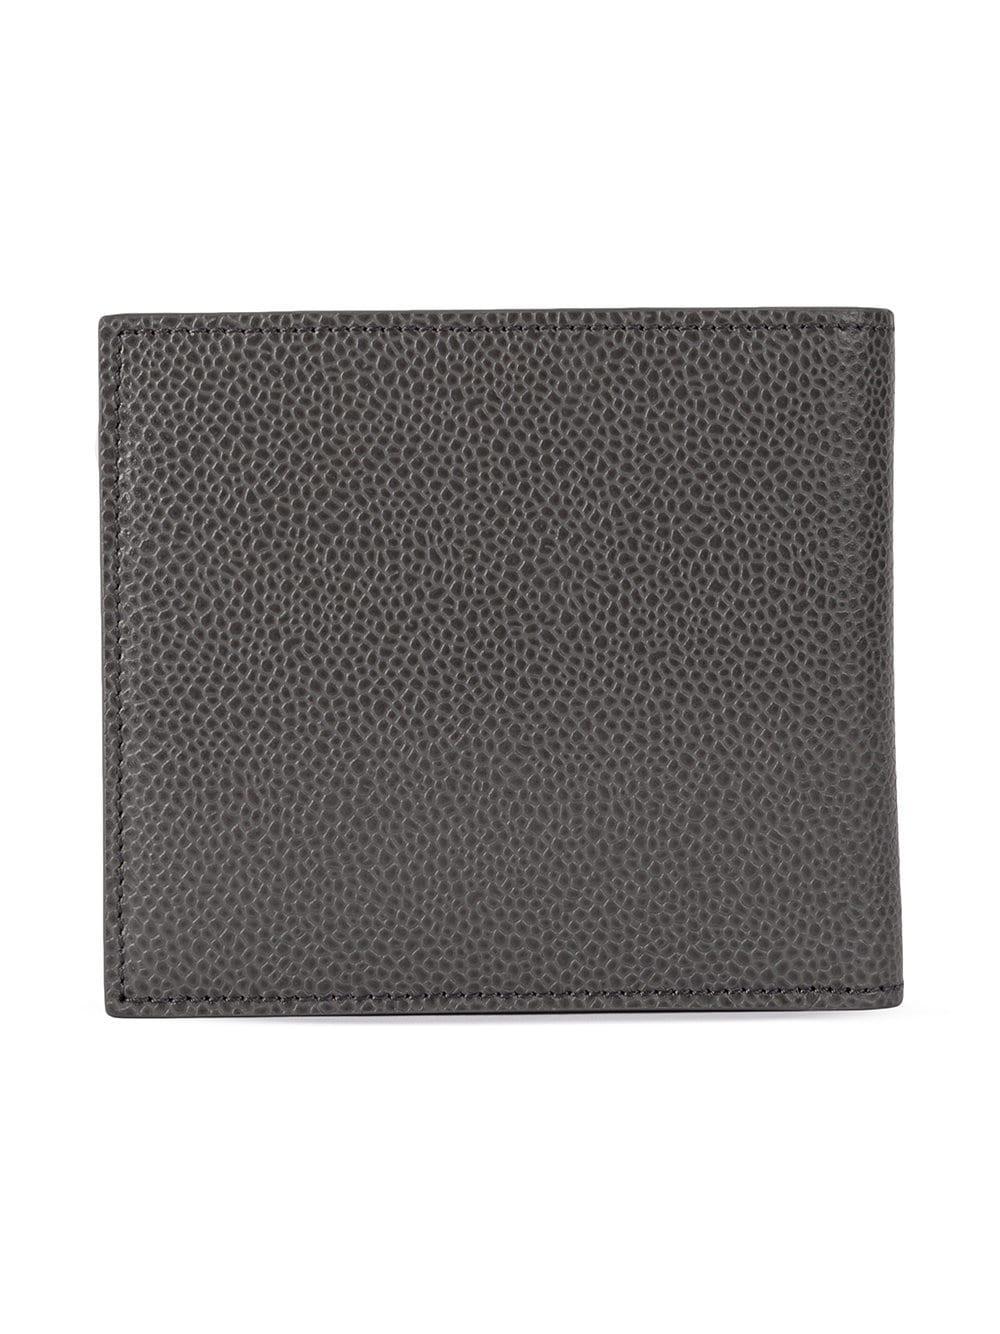 cd1dd5f5ed1d Thom Browne Grey Striped Bifold Wallet in Gray for Men - Lyst